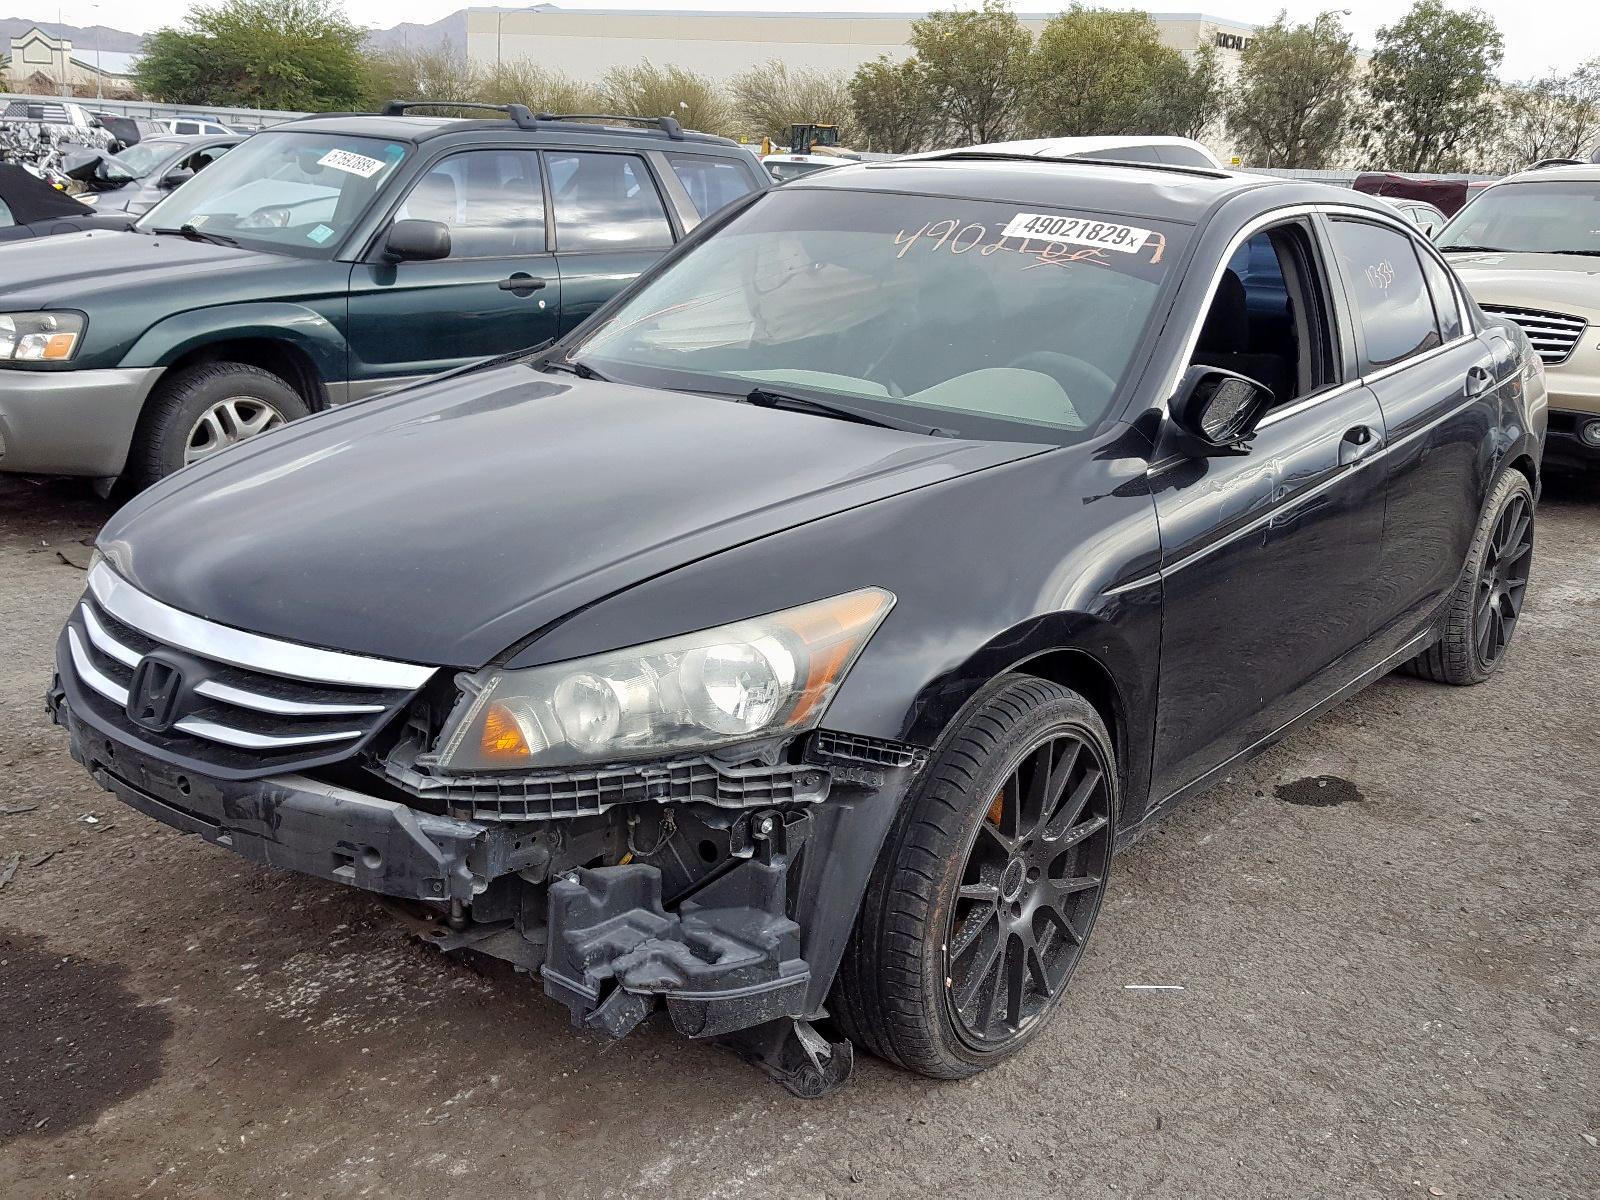 2011 Honda Accord Ex 2.4L Right View